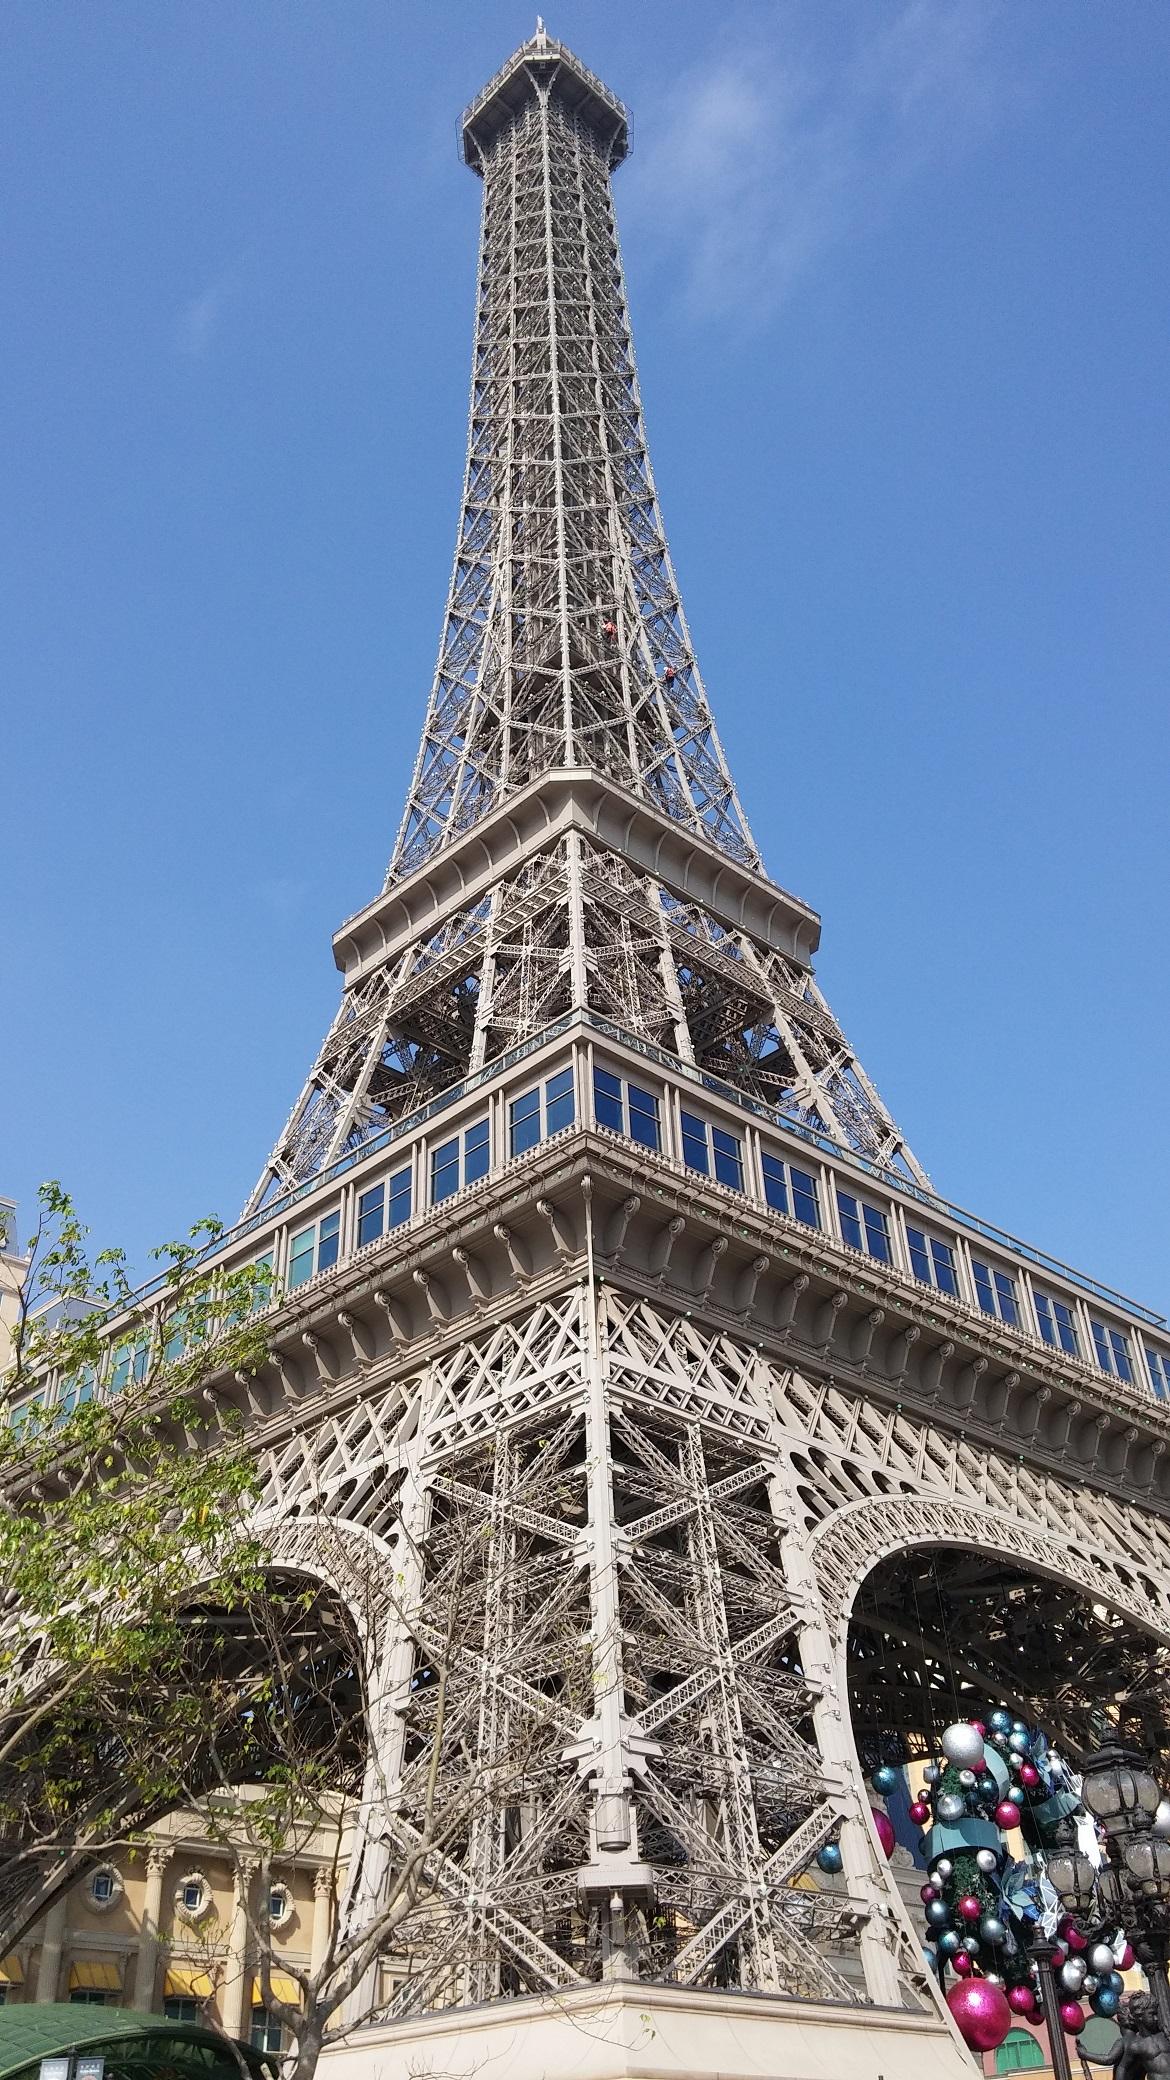 Mini Eiffel Tower in Macau